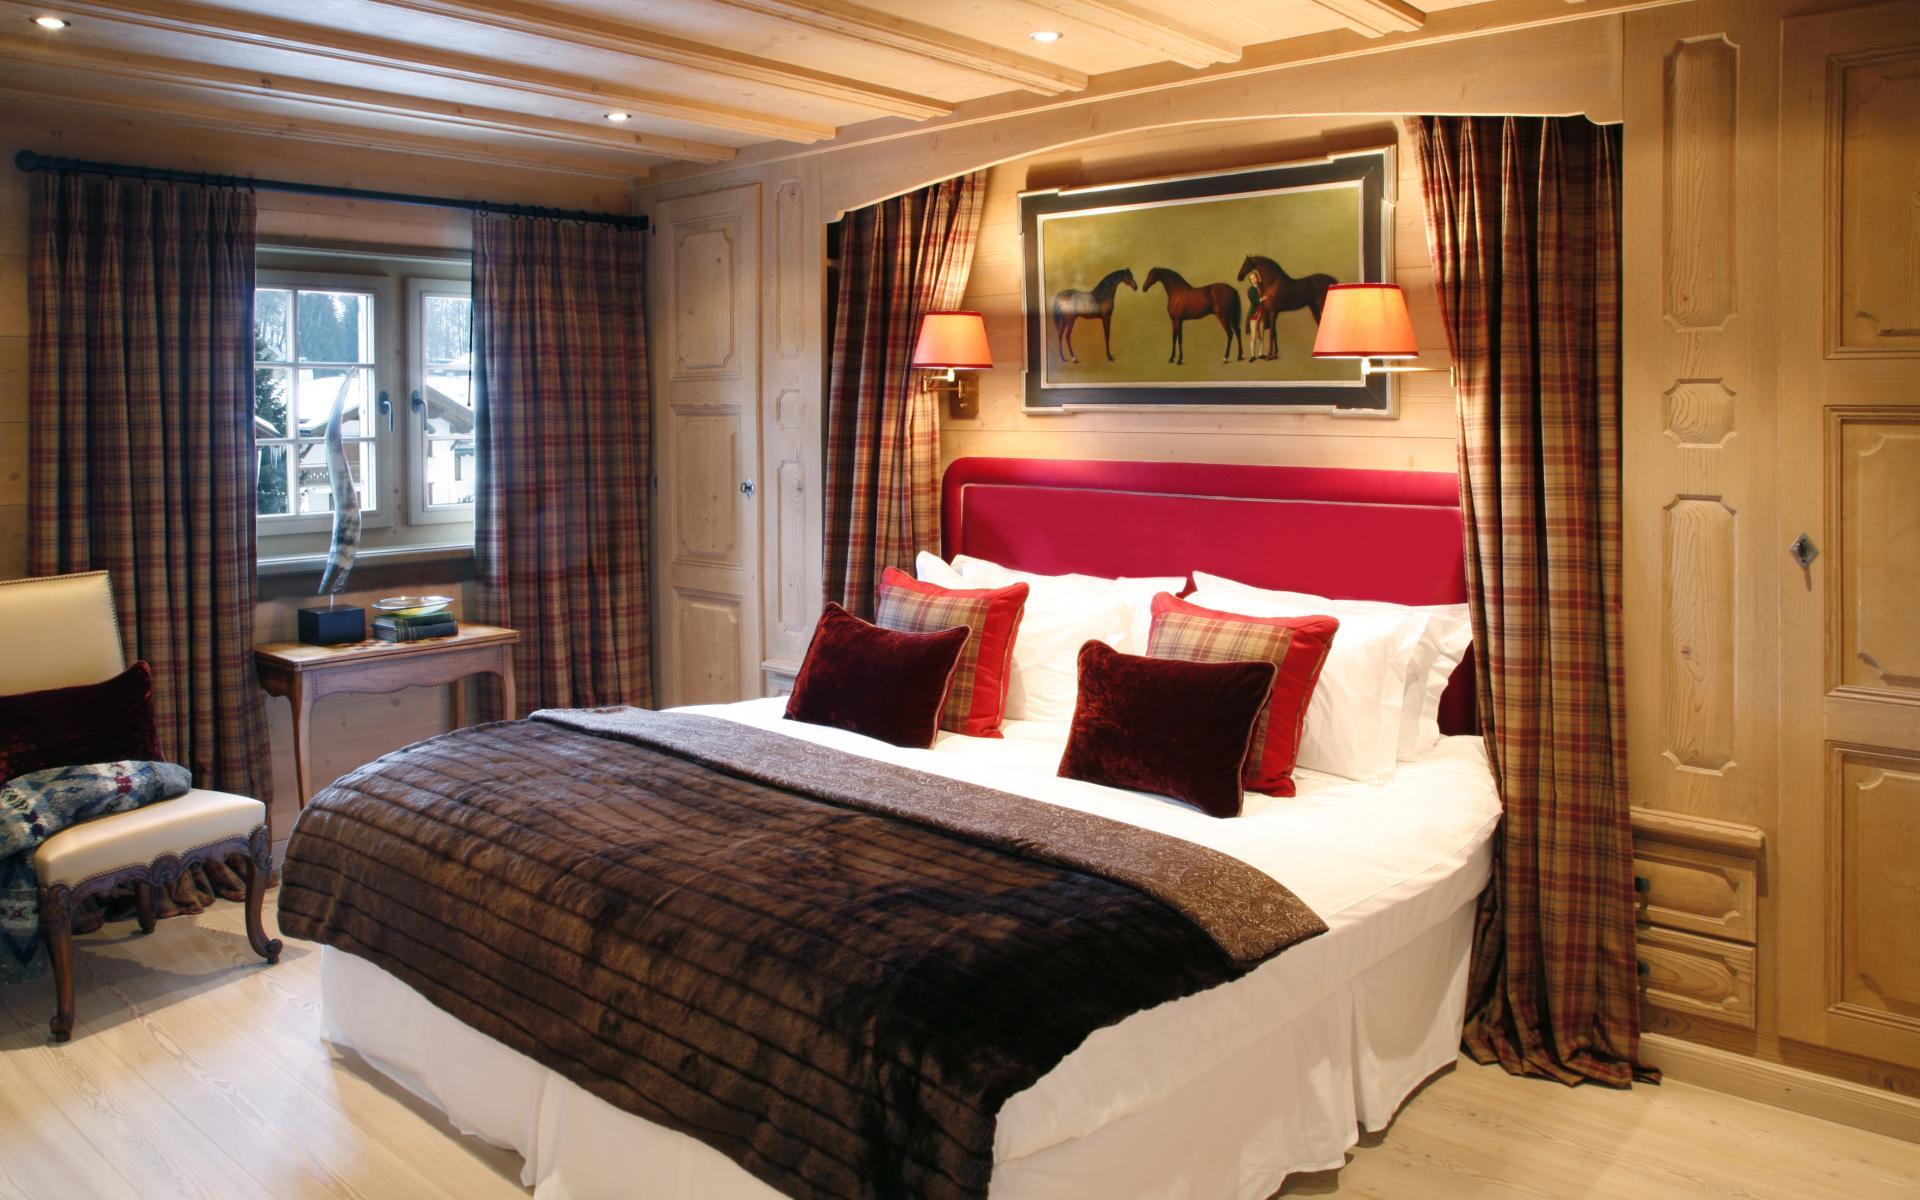 Room at Tivoli Lodge.